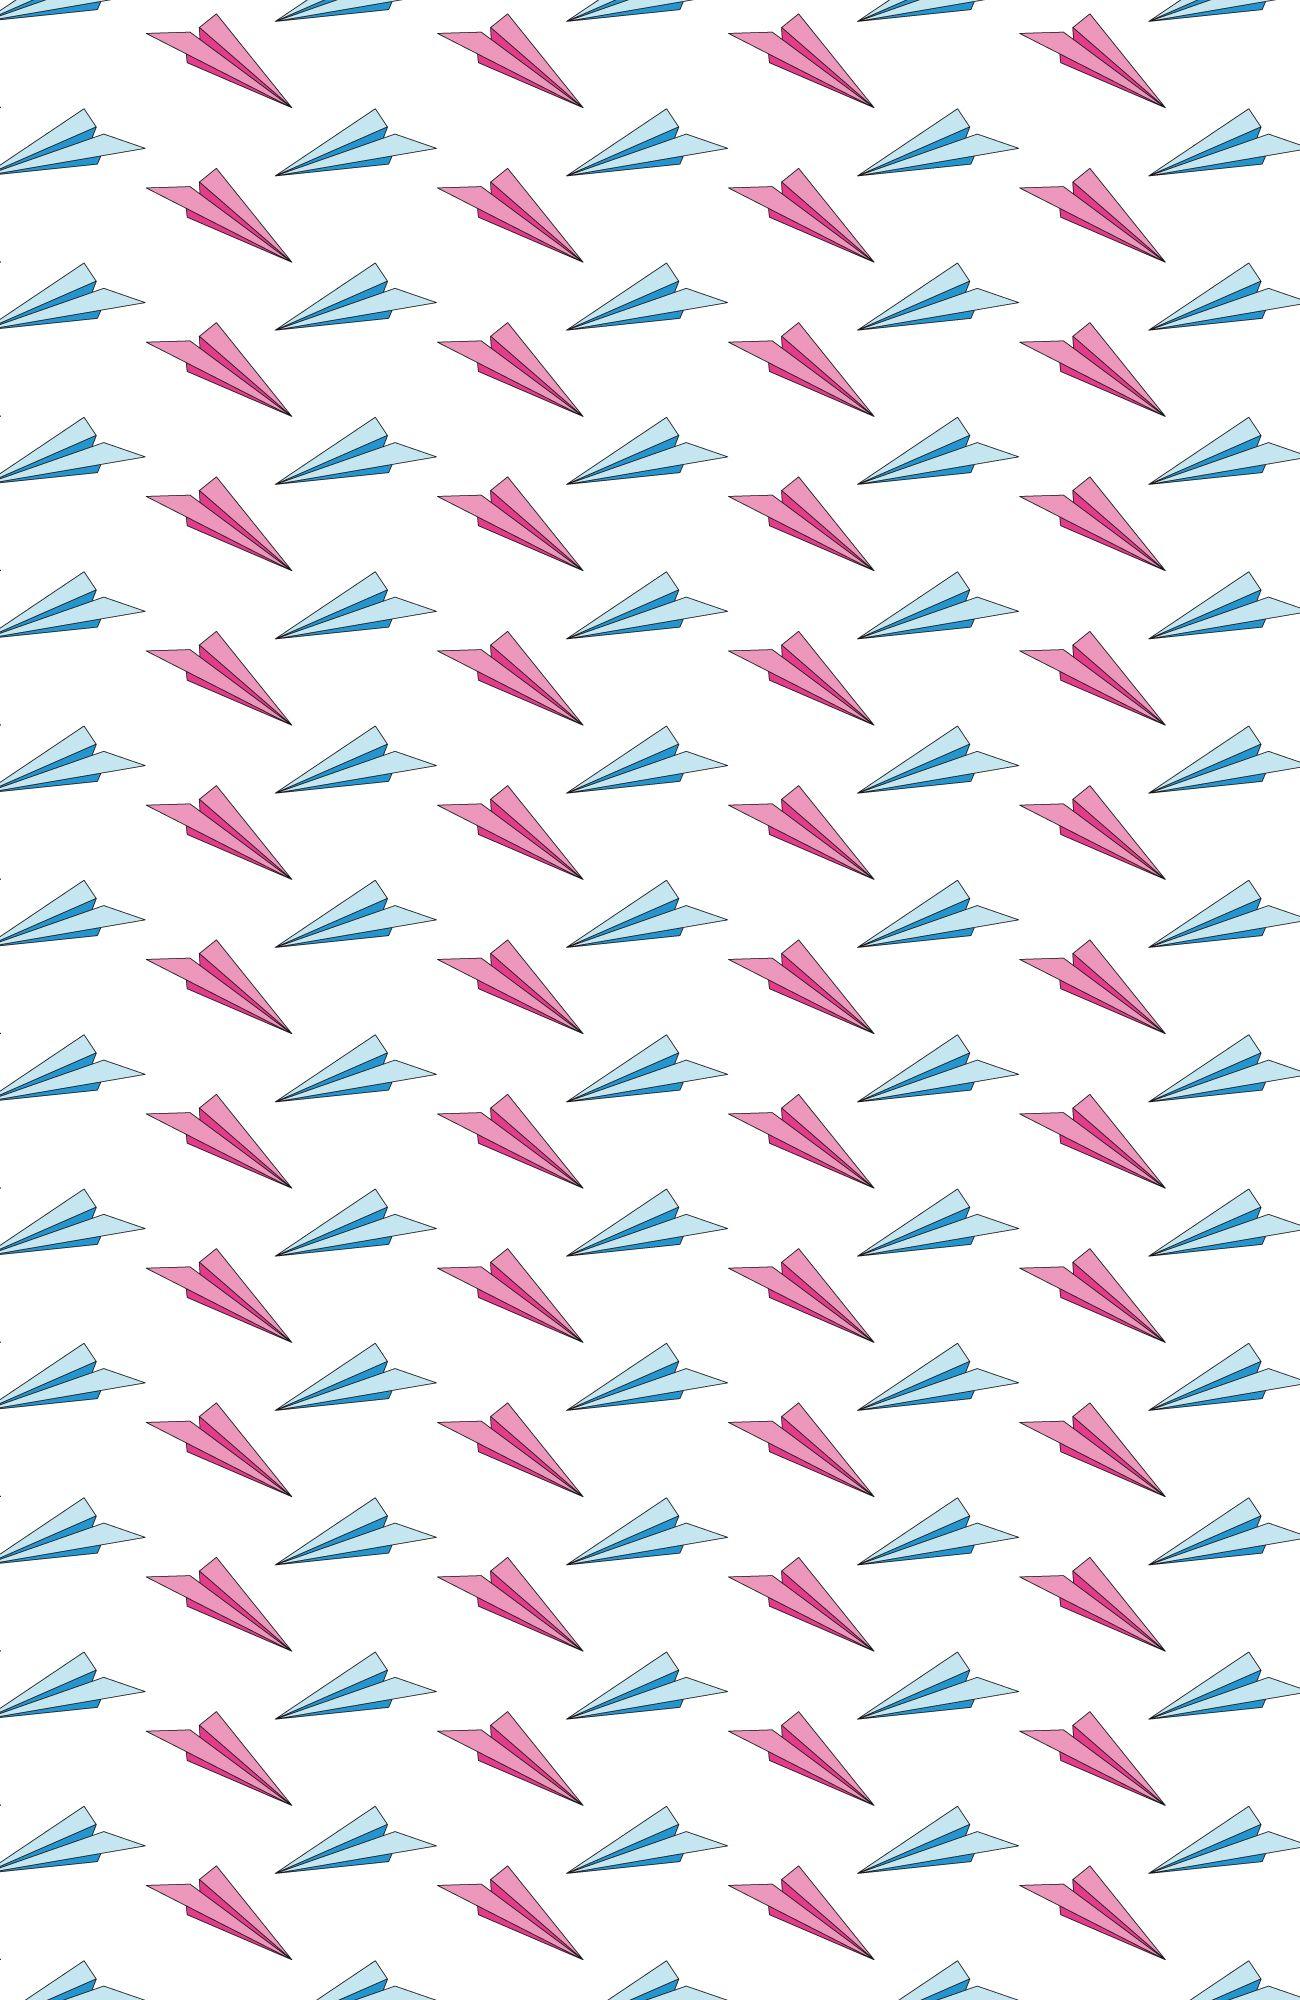 #paper #paperplane #pattern #patterndesign #textile #fashion #illustration #exit2wonderland #plane #childhood #pink #blue #graphic #illustrator #vector #colorful #playful #fly #flyinf